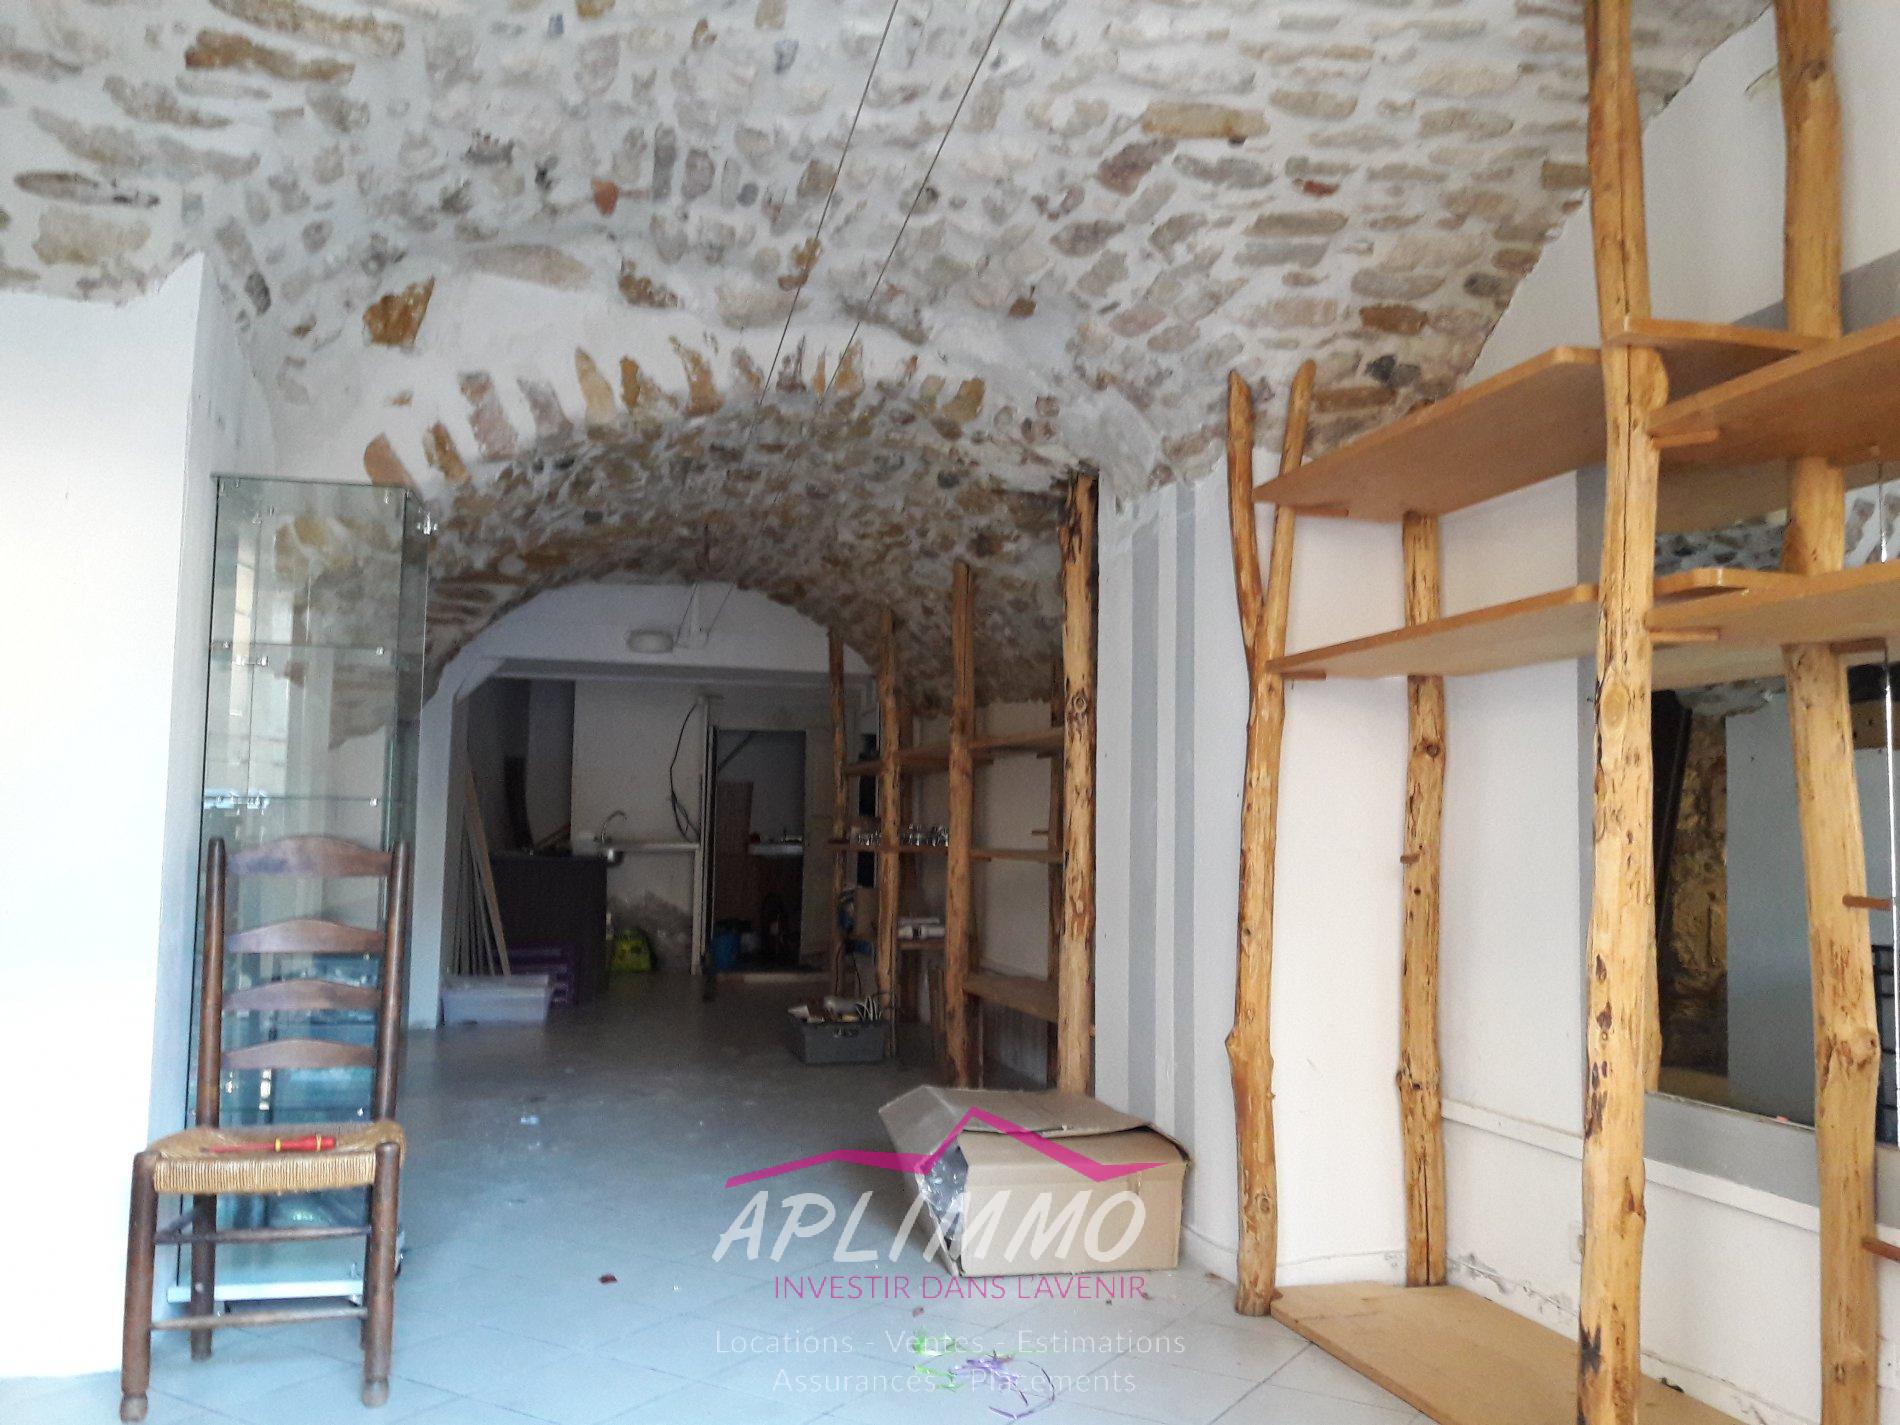 Location Immobilier Professionnel Local commercial Vallon-Pont-d'Arc (07150)